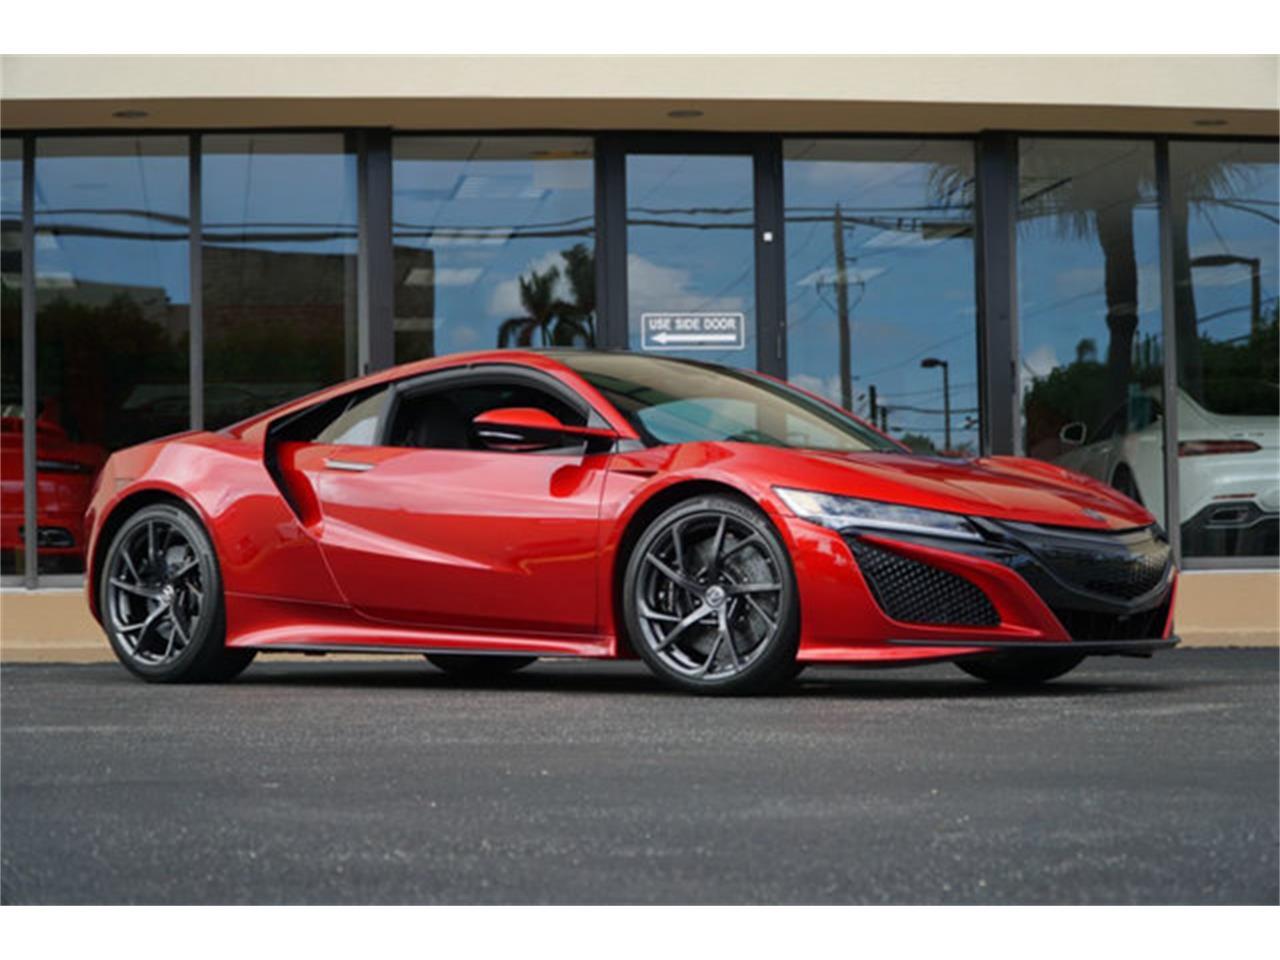 2017 Acura Nsx For Sale >> For Sale 2017 Acura Nsx In Miami Florida